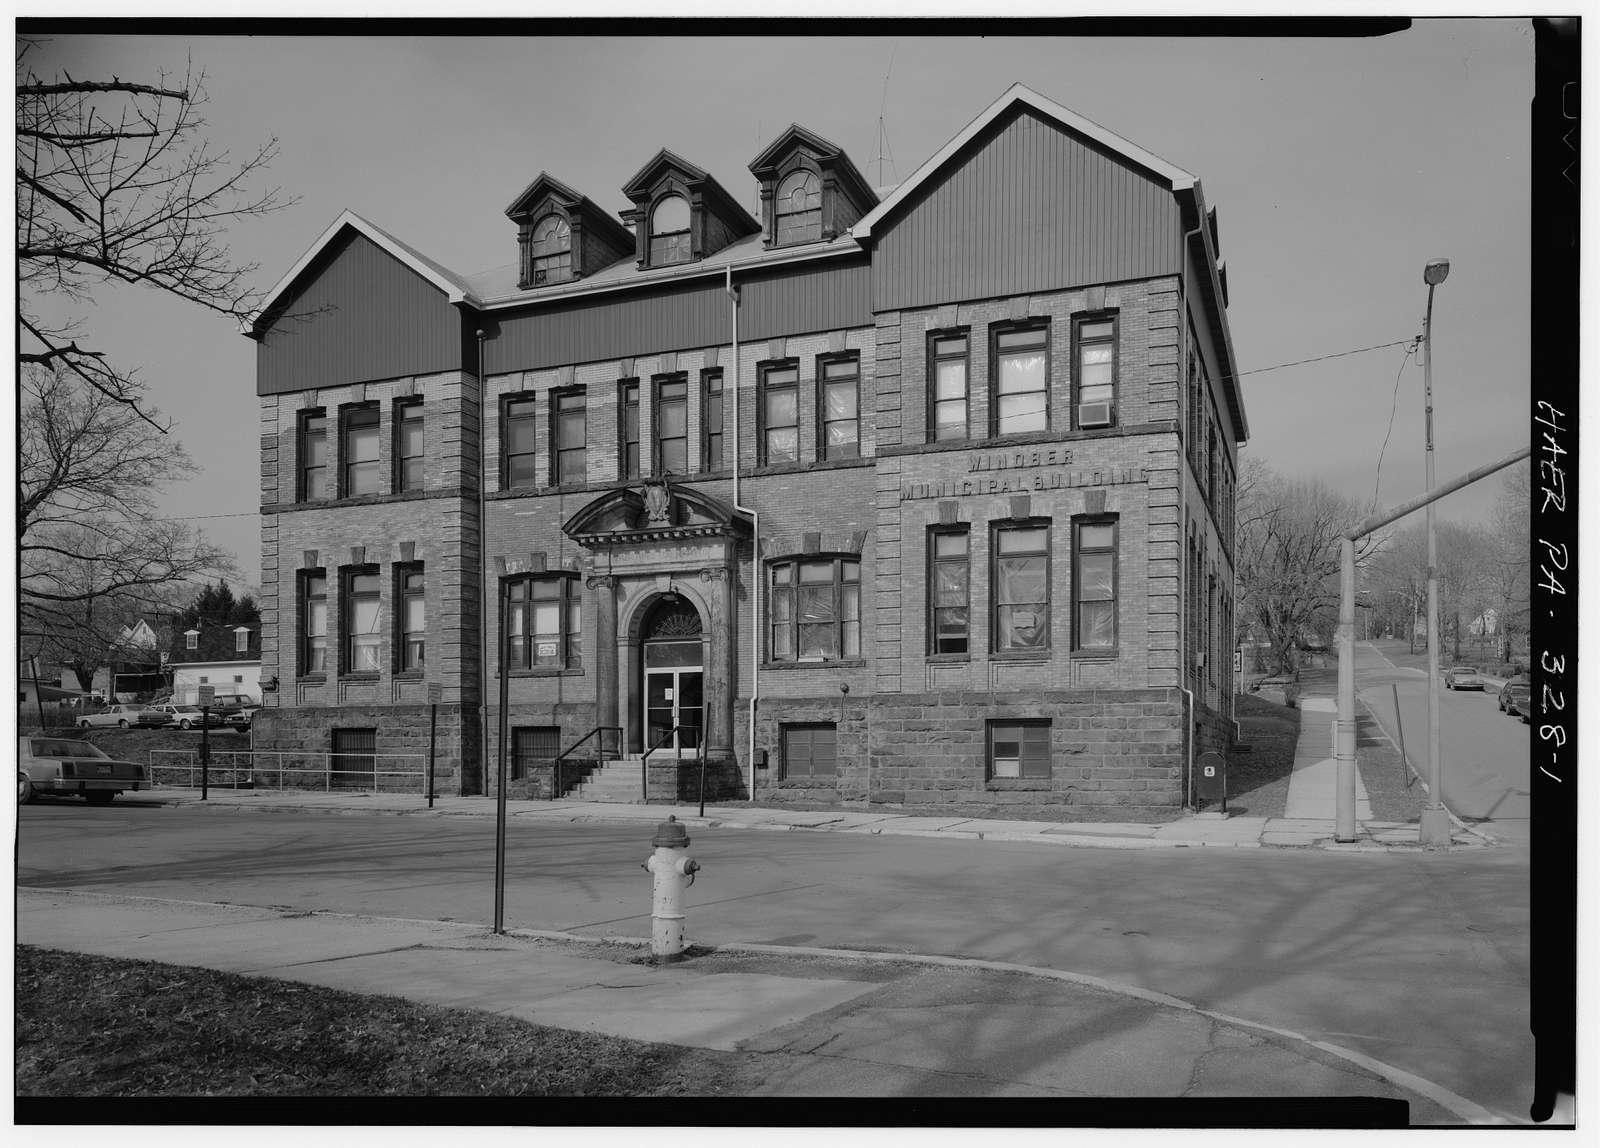 Berwind-White Coal Mining Company, Main Office, Fifteenth Street & Somerset Avenue, Windber, Somerset County, PA